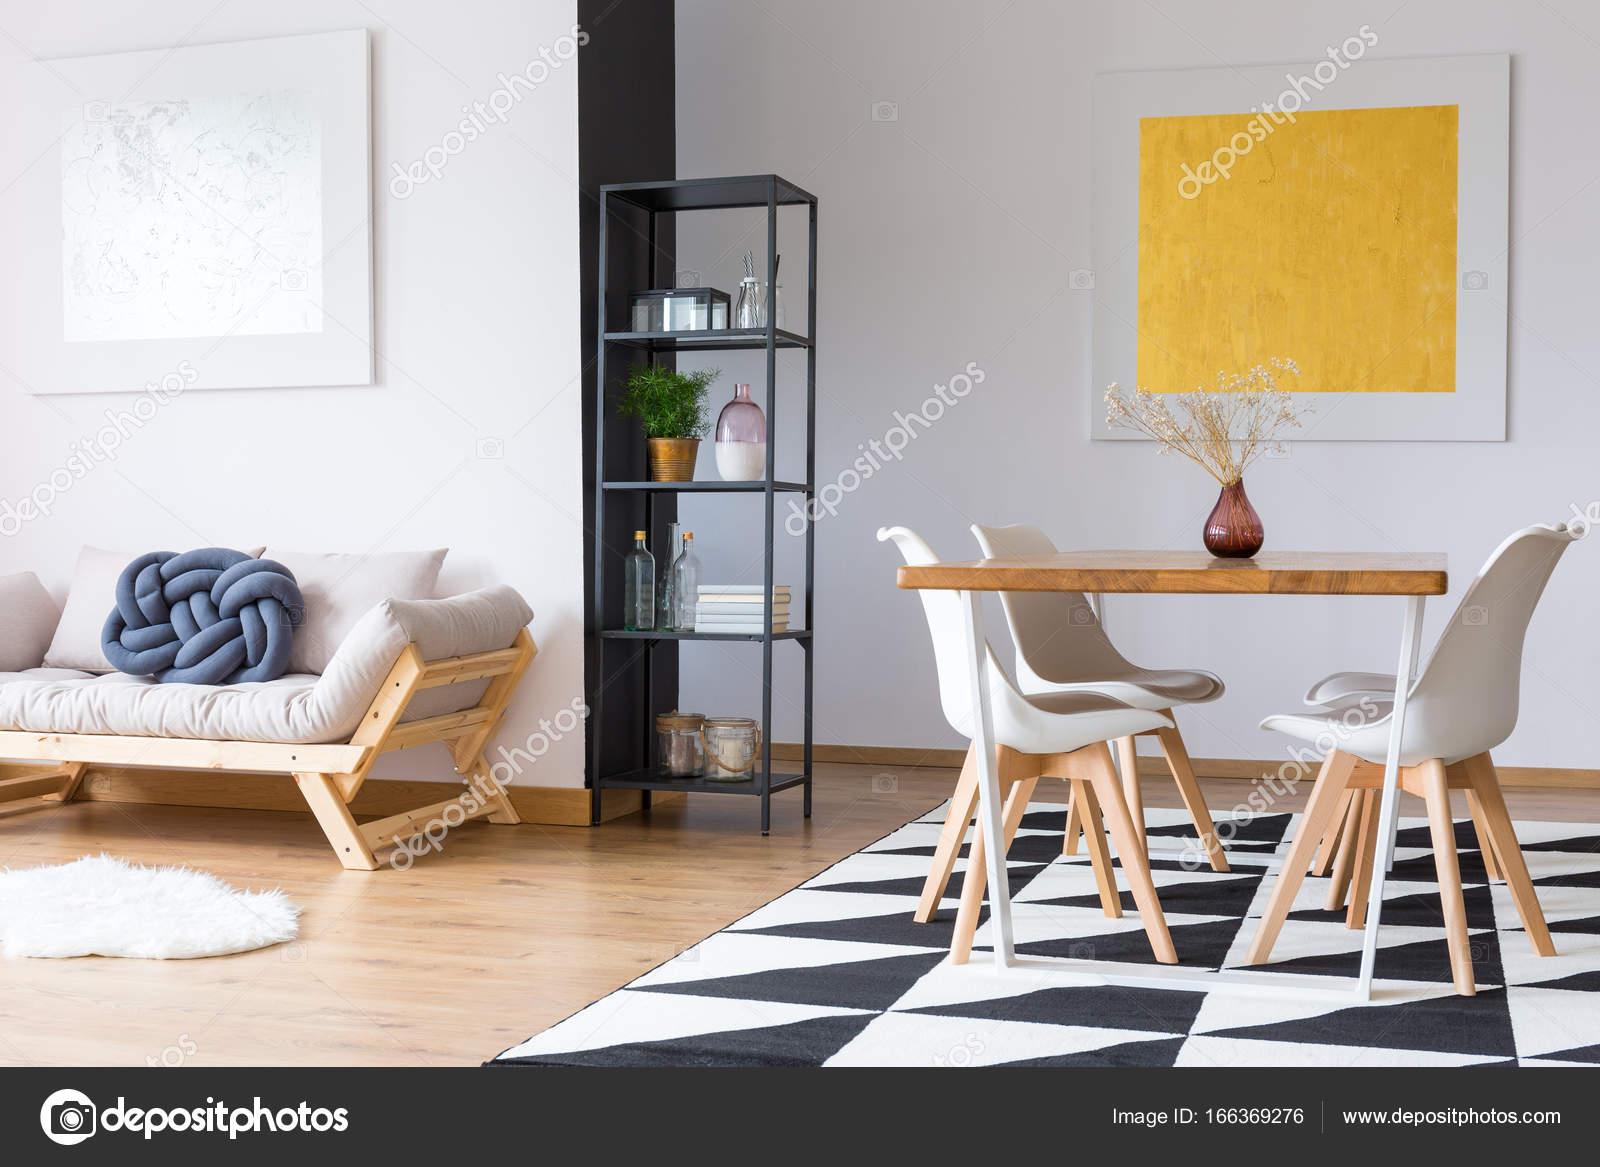 Paintings In Modern Dining Room Stock, Dining Room Paintings